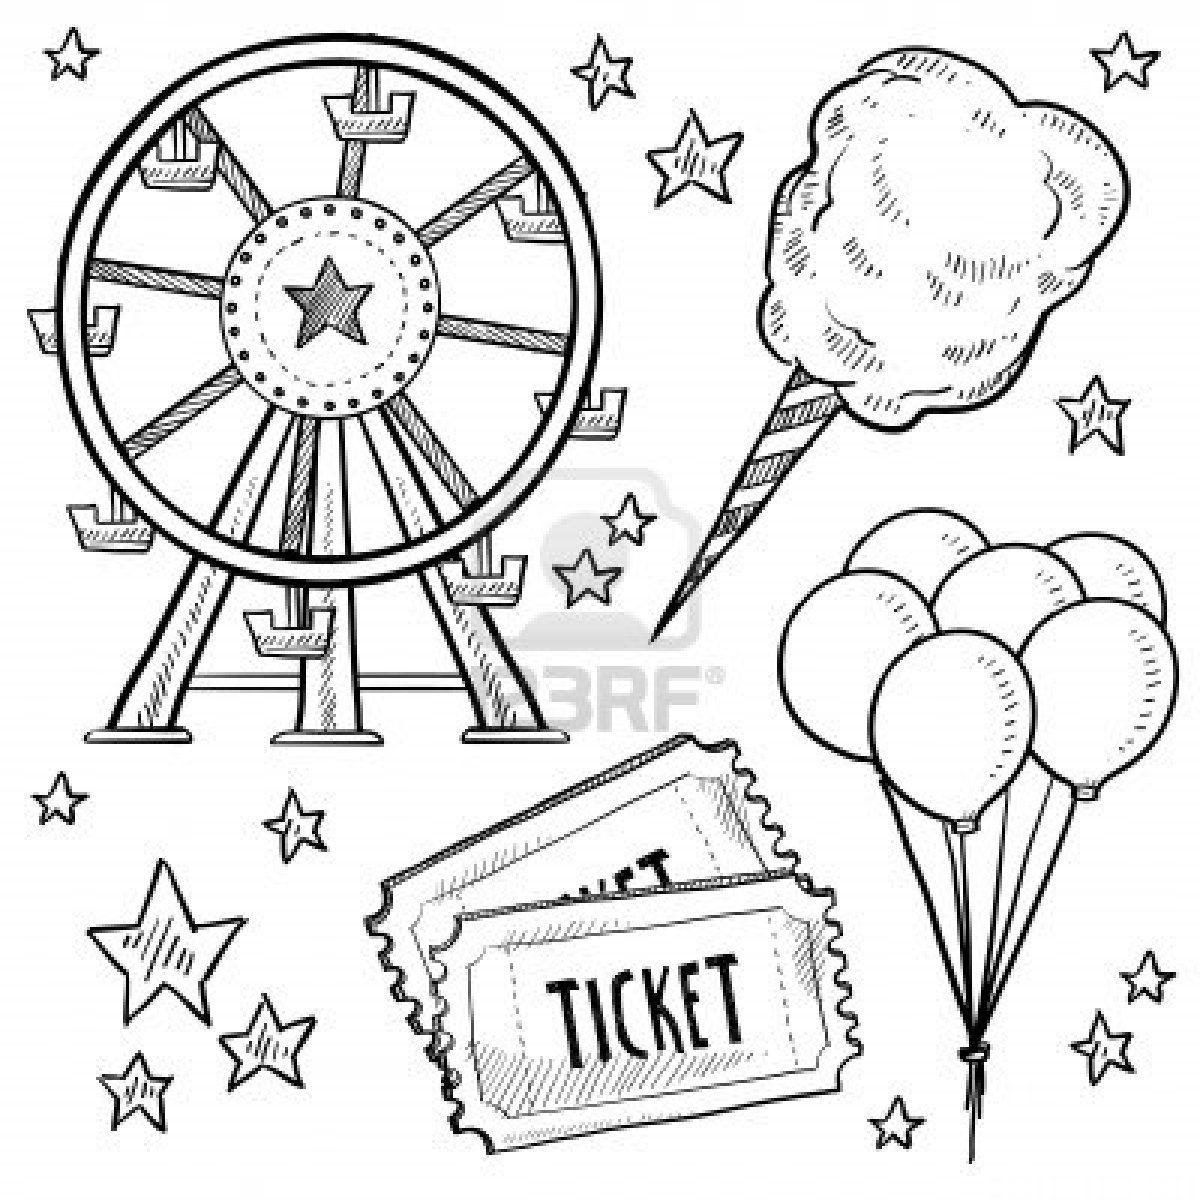 Doodle Style Amusement Park Or Carnival Equipment Sketch